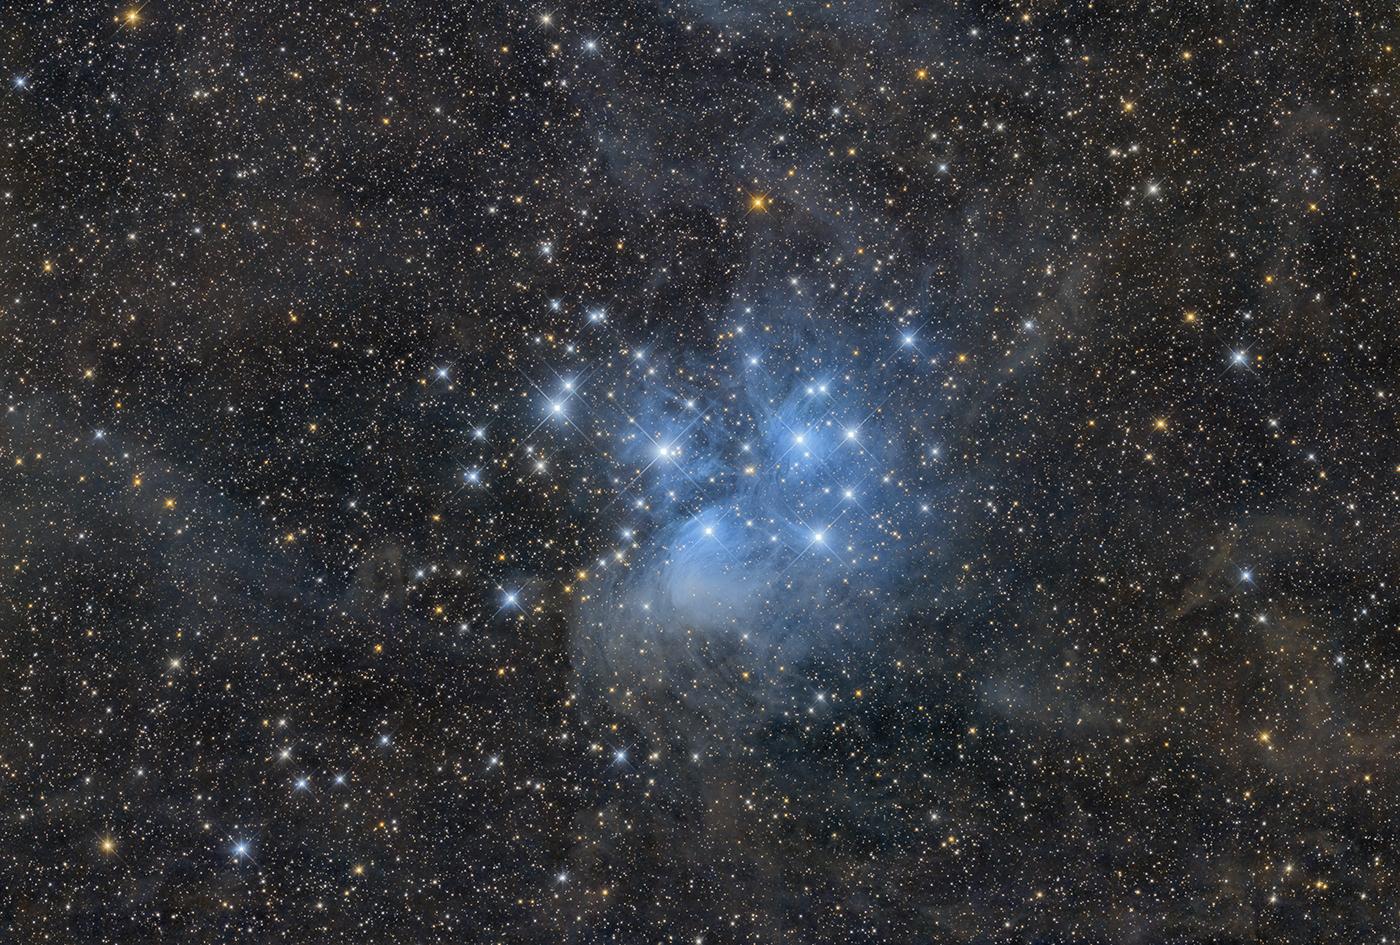 M45_20161229_E130_Eos6d